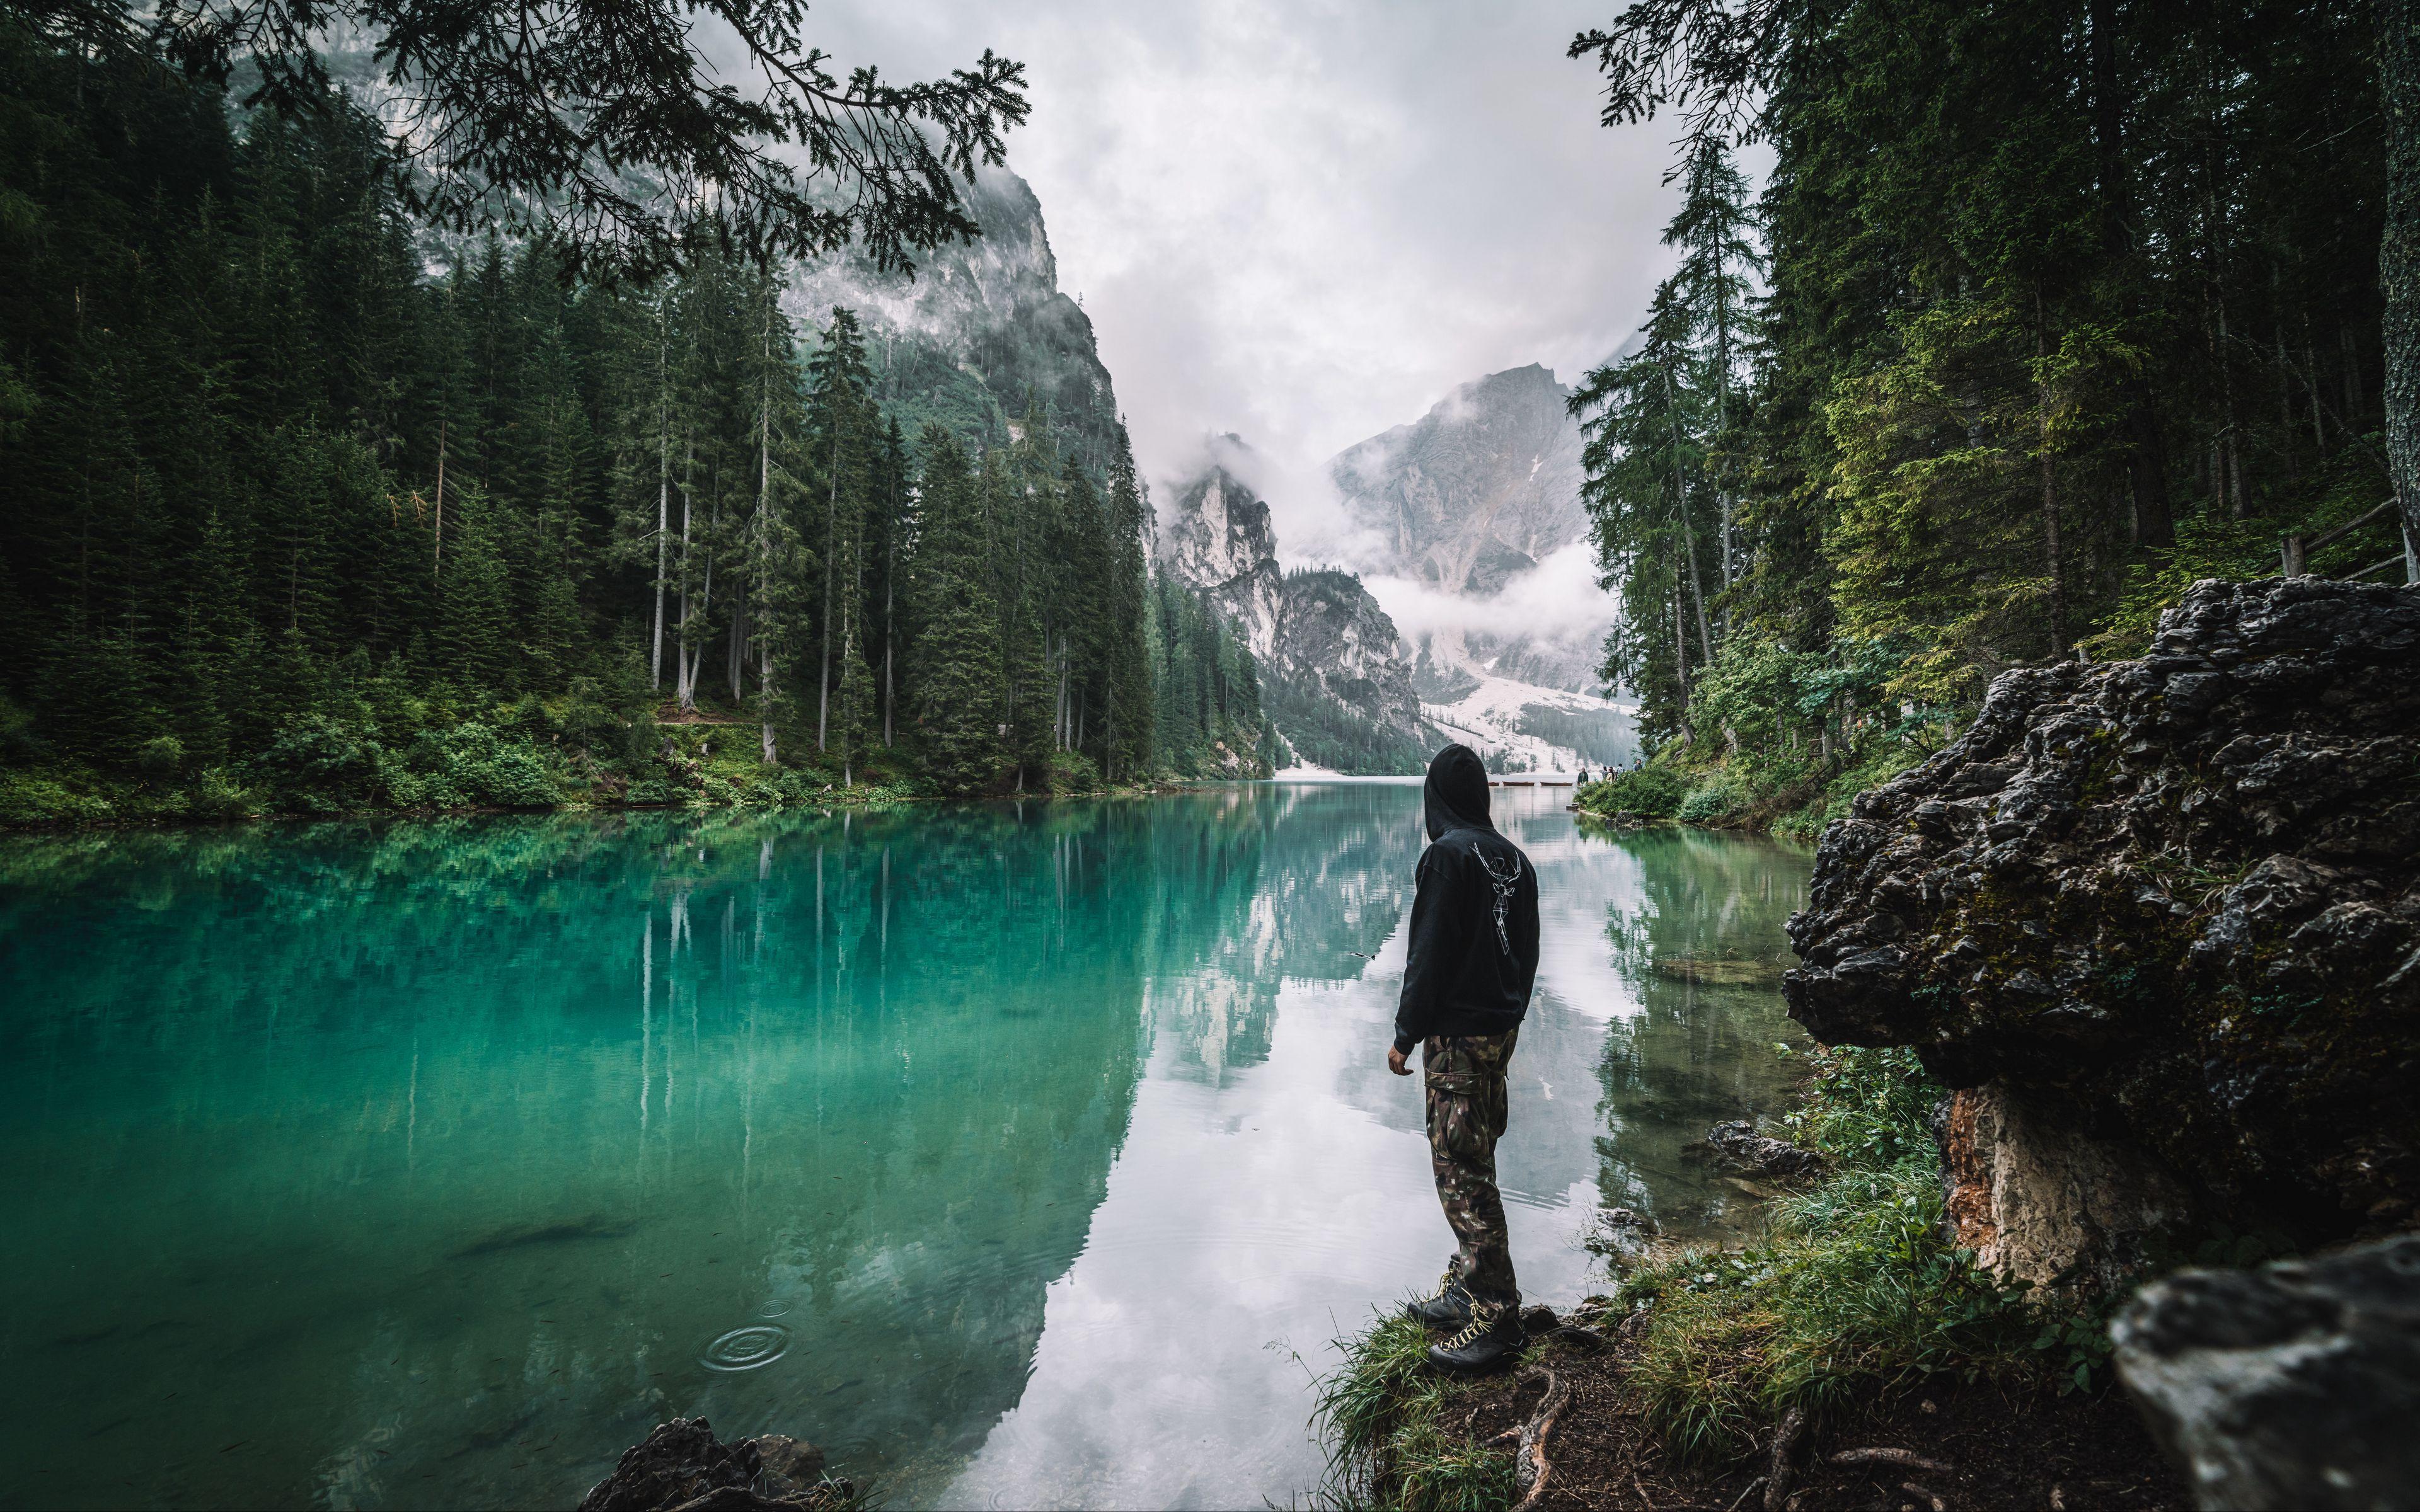 Fondos de pantalla Hombre frente a lago en el bosque